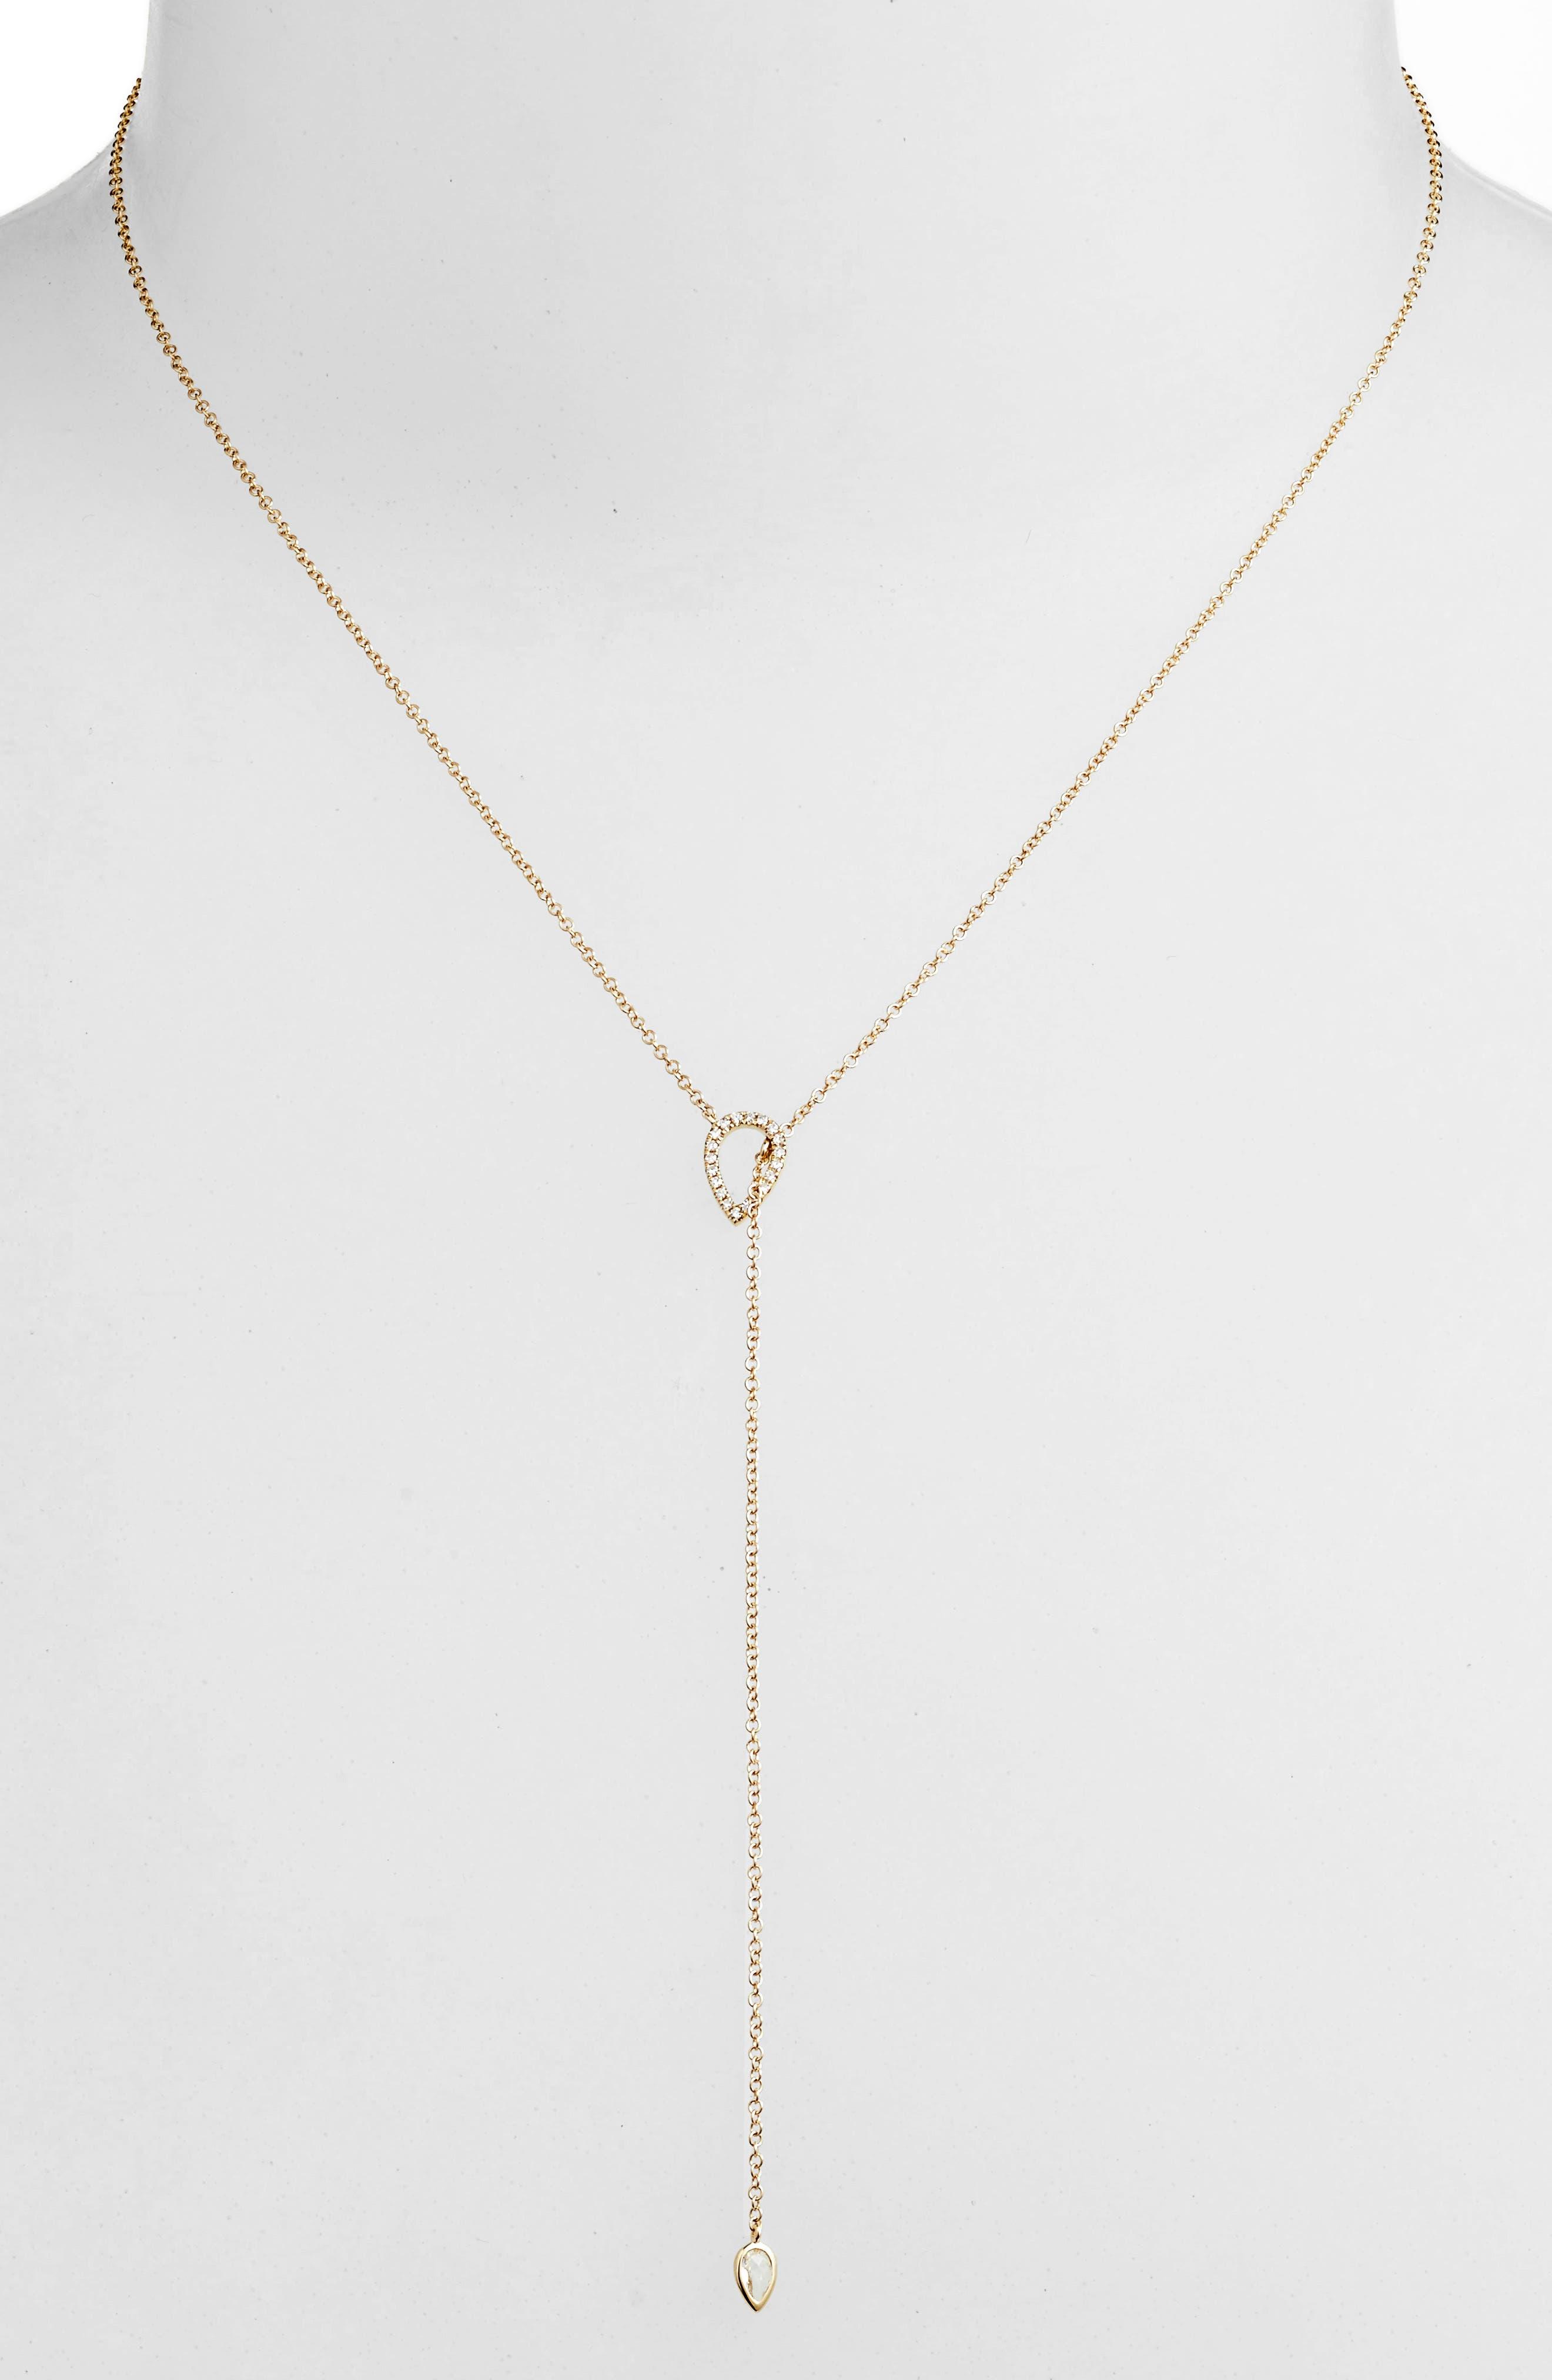 Main Image - EF COLLECTION Teardrop Diamond Lariat Necklace